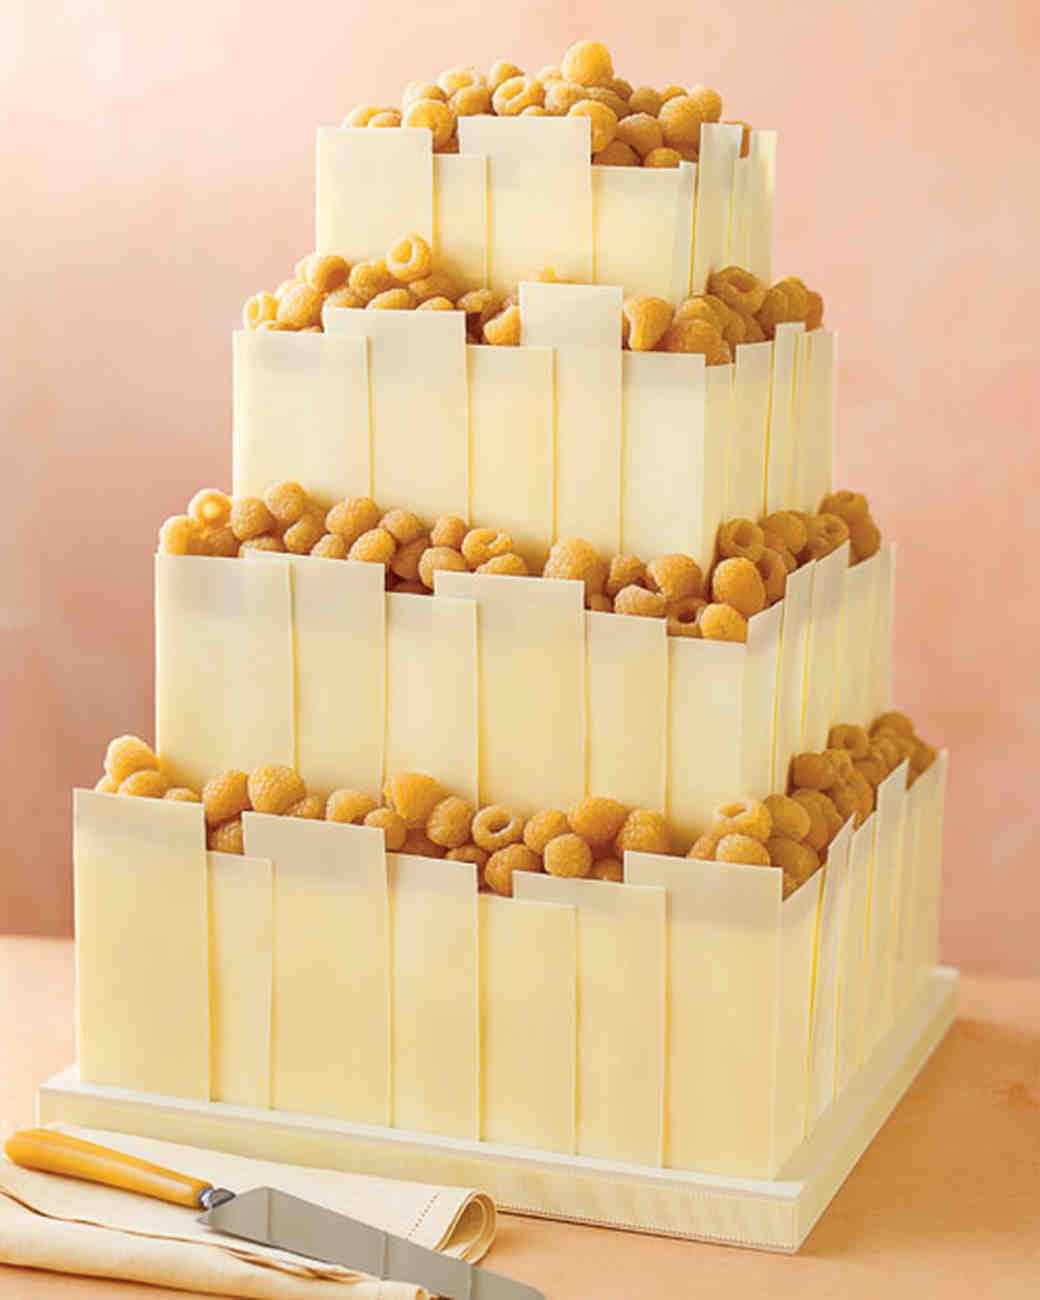 Almond Wedding Cake Recipe Martha Stewart  11 DIY Wedding Cake Ideas That Will Transform Your Tiers